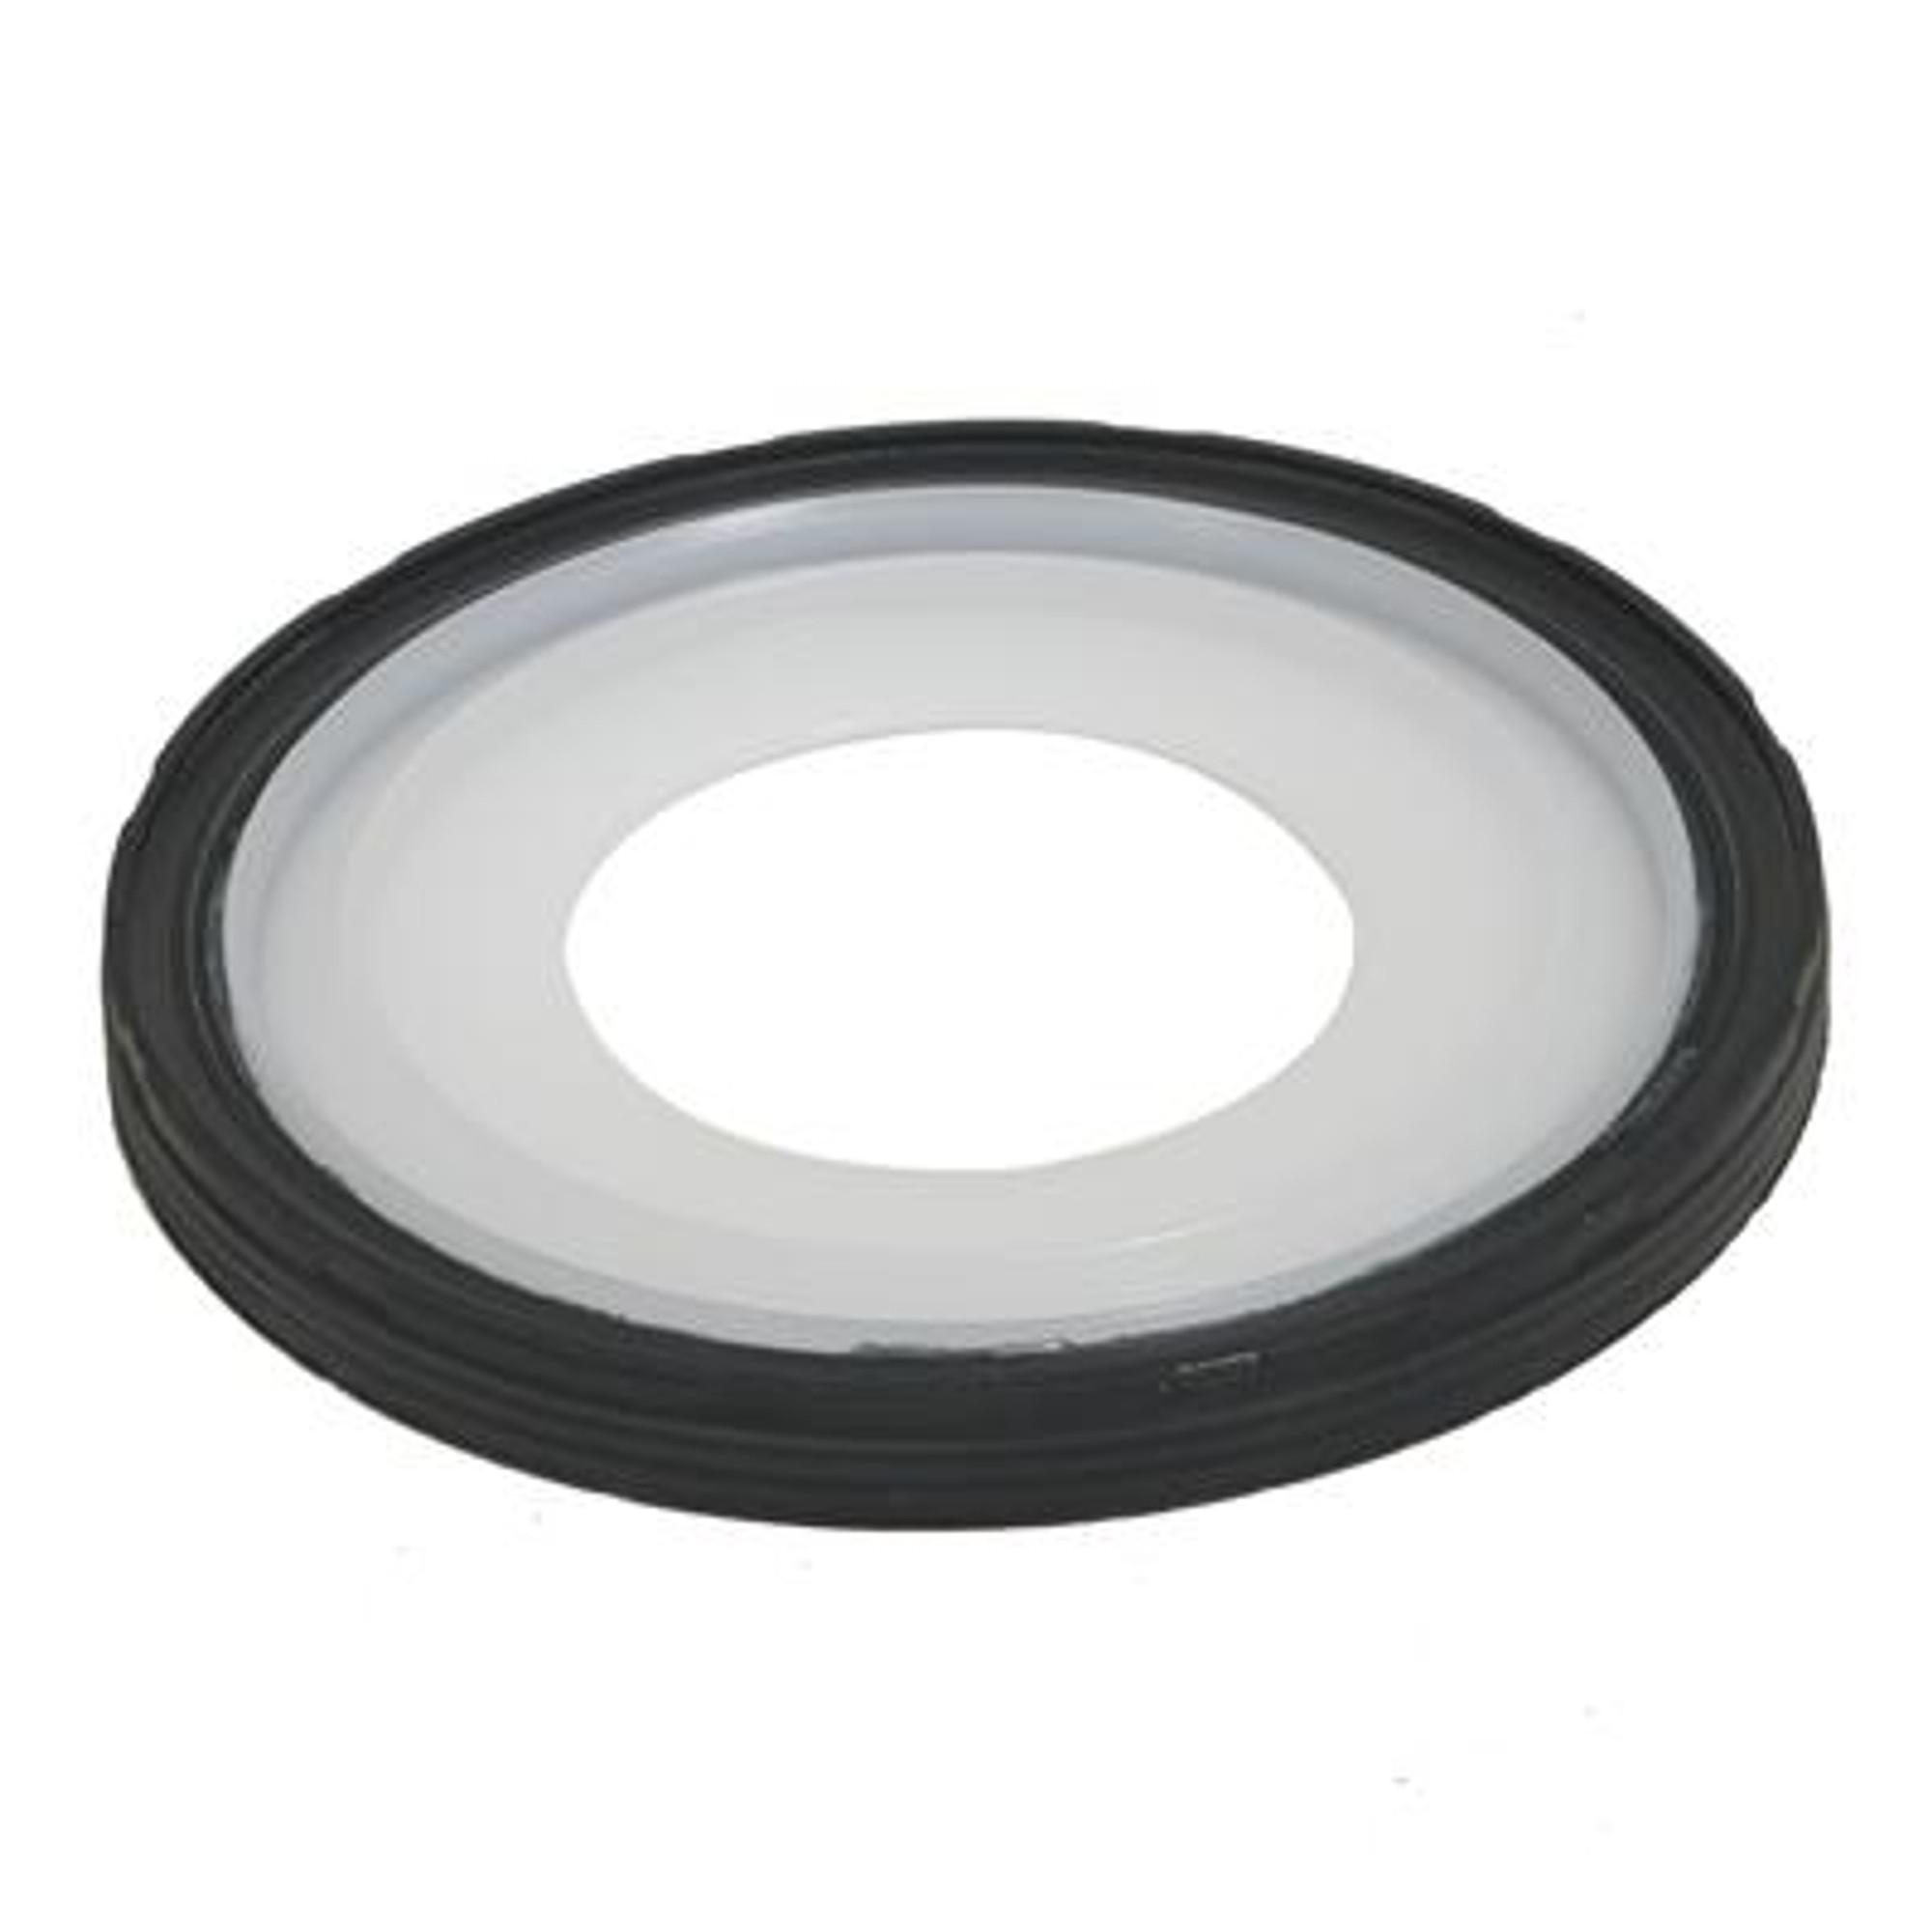 Genuine GM 89018163 Crankshaft Oil Seal Kit Rear